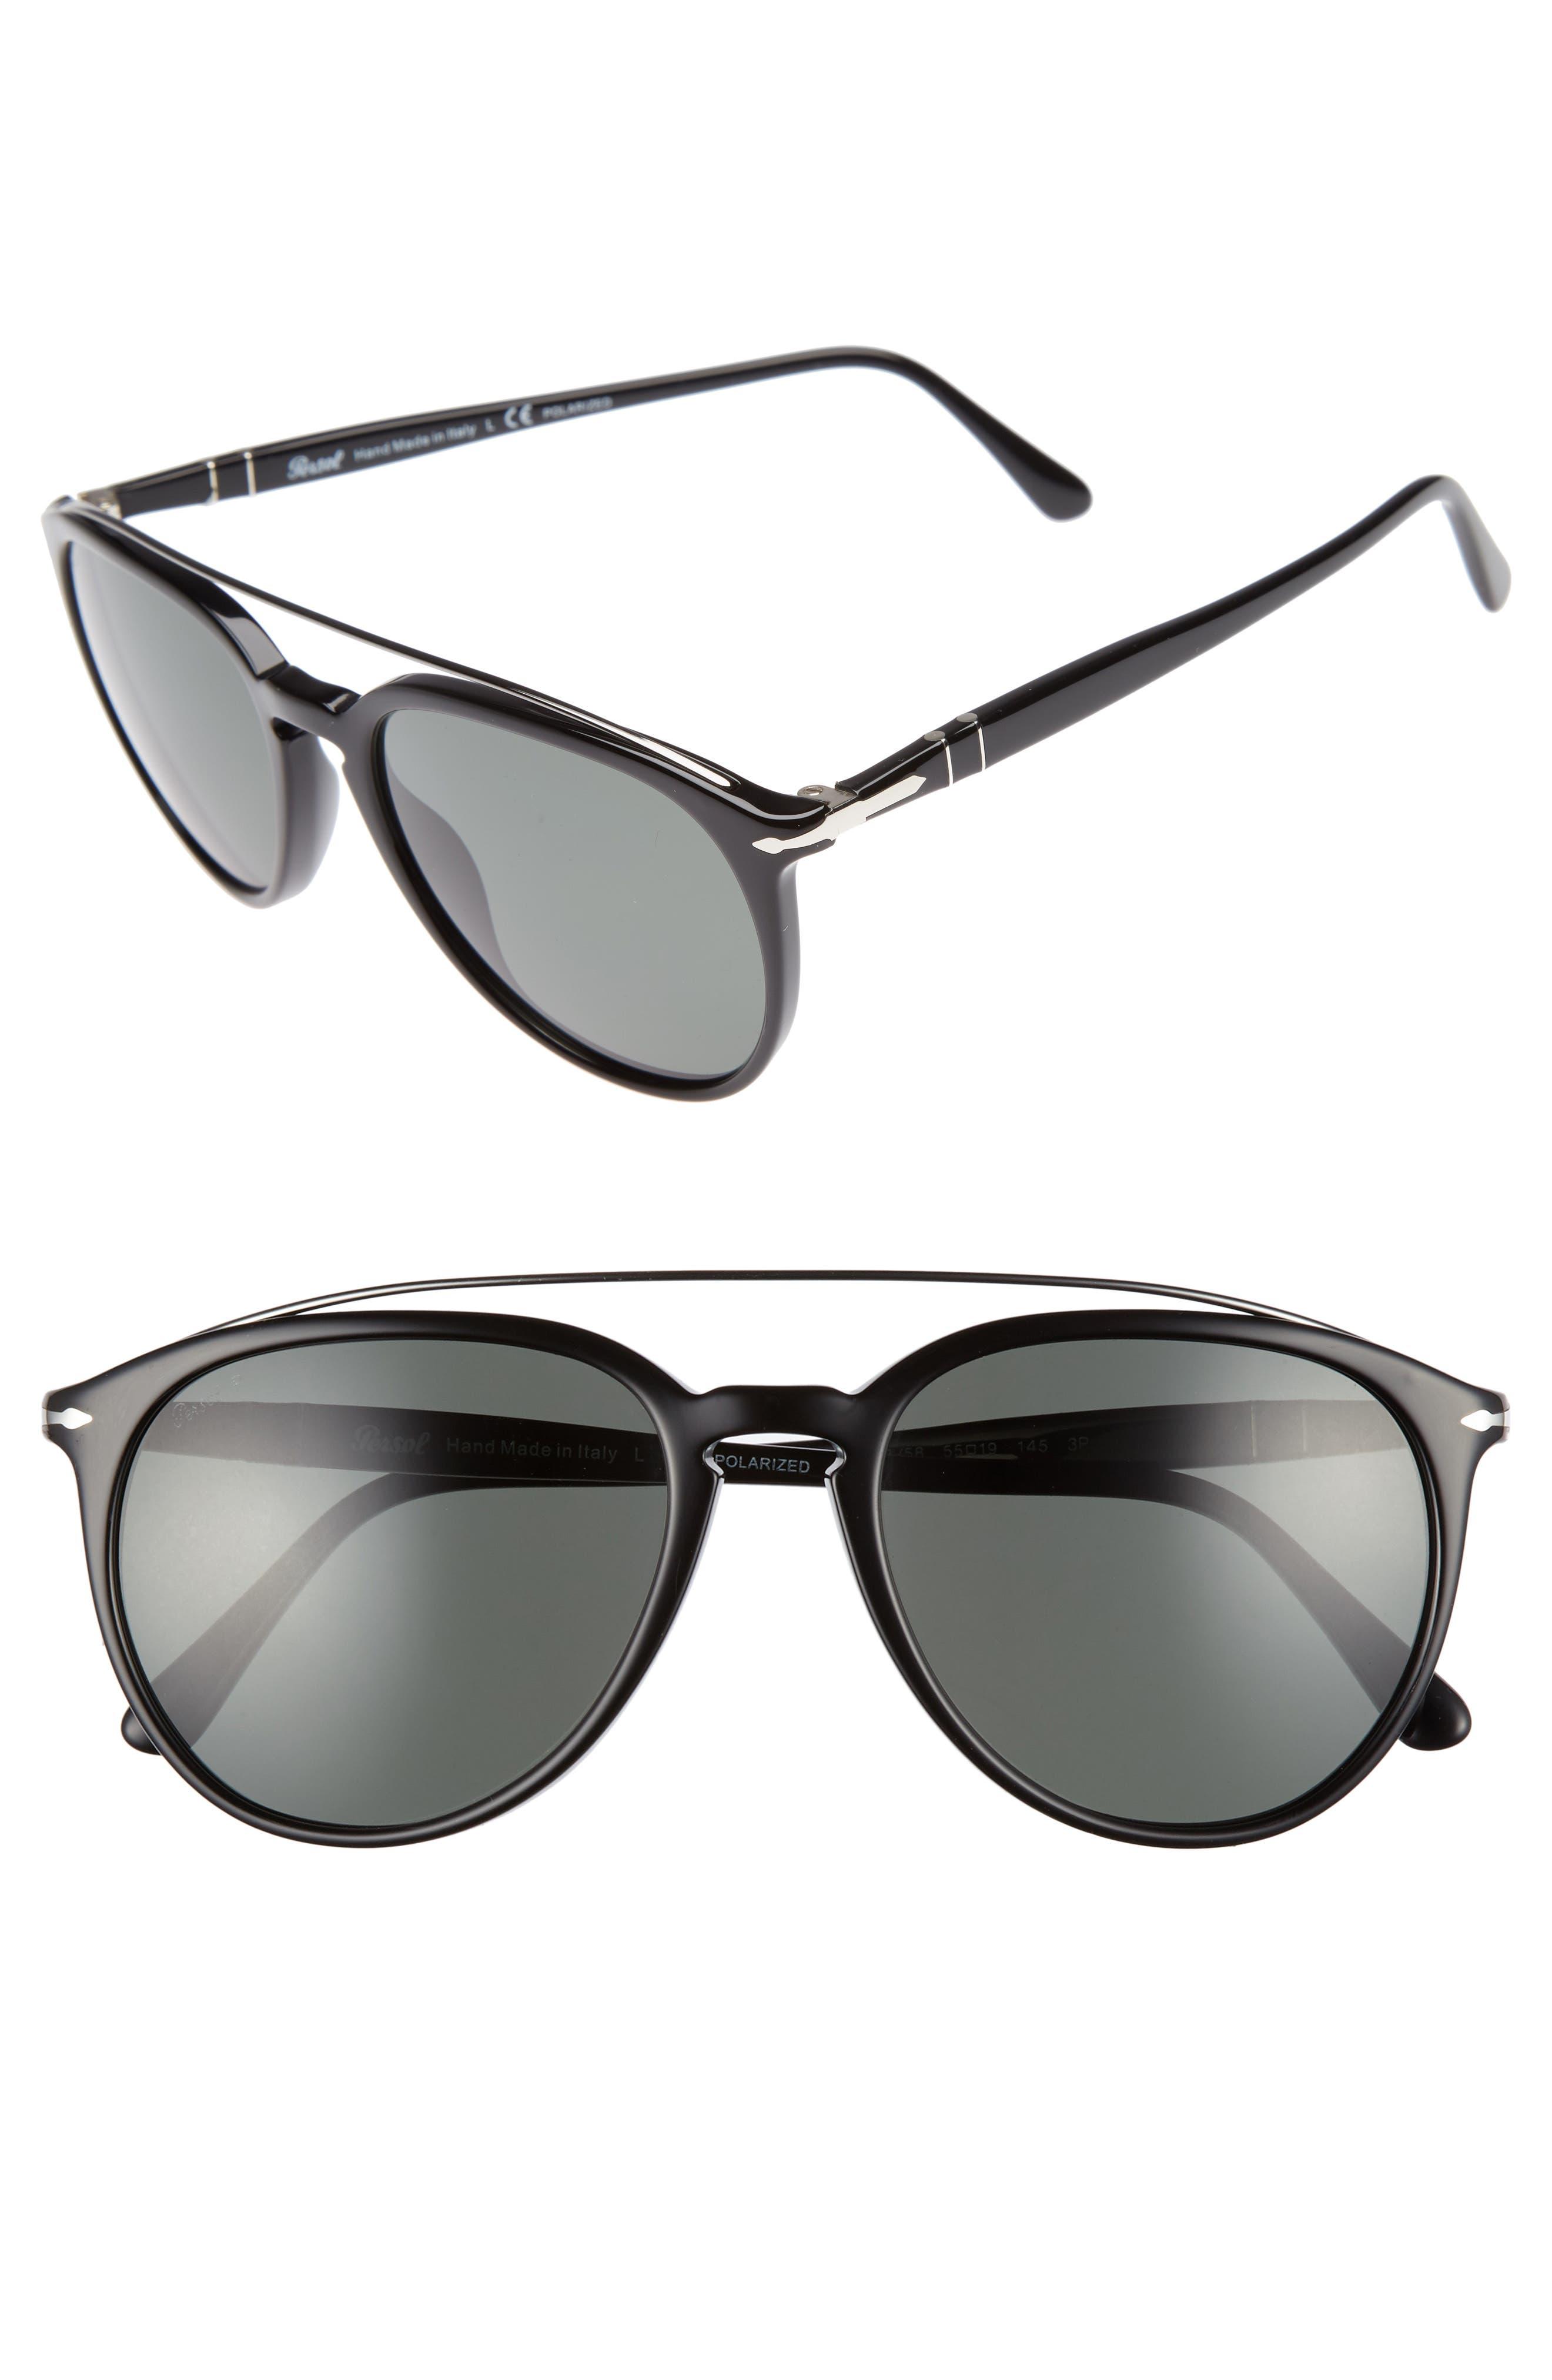 Sartoria 55mm Polarized Sunglasses,                             Main thumbnail 1, color,                             BLACK/ GREEN